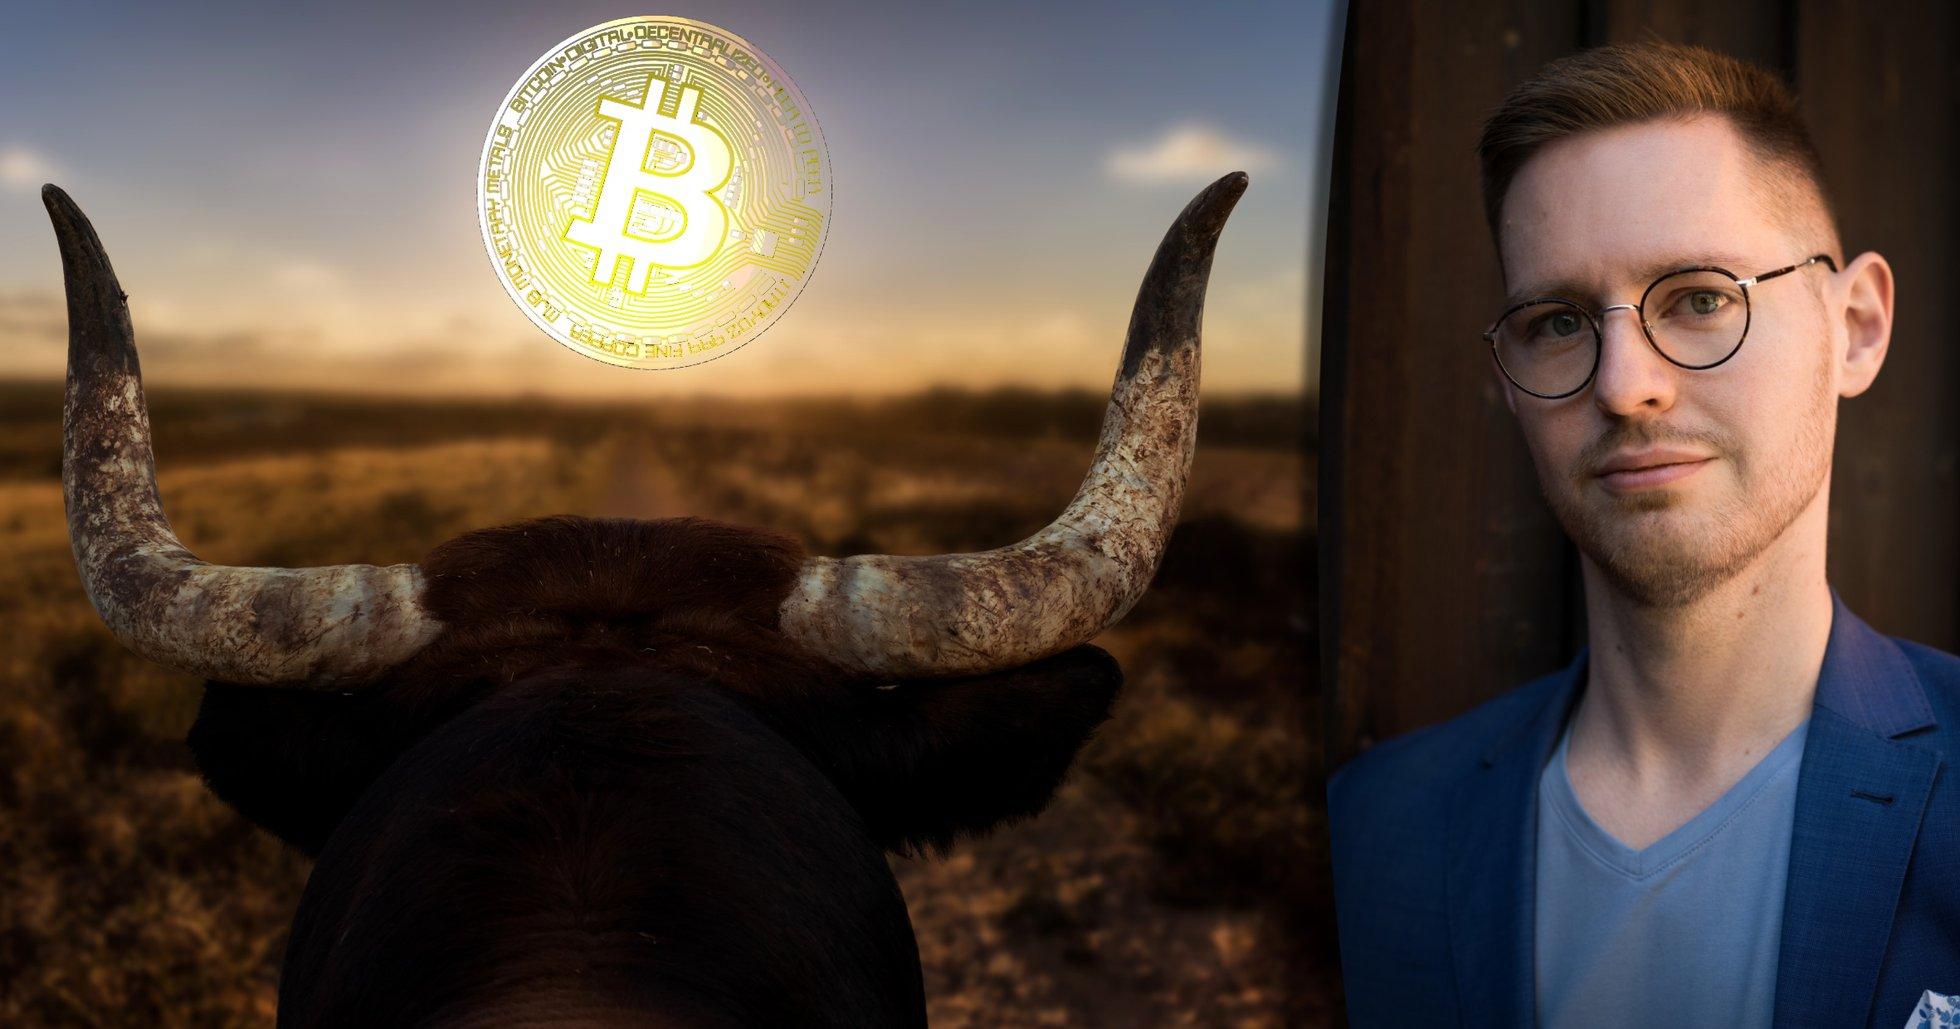 Expert när bitcoinpriset når 14 500 dollar: